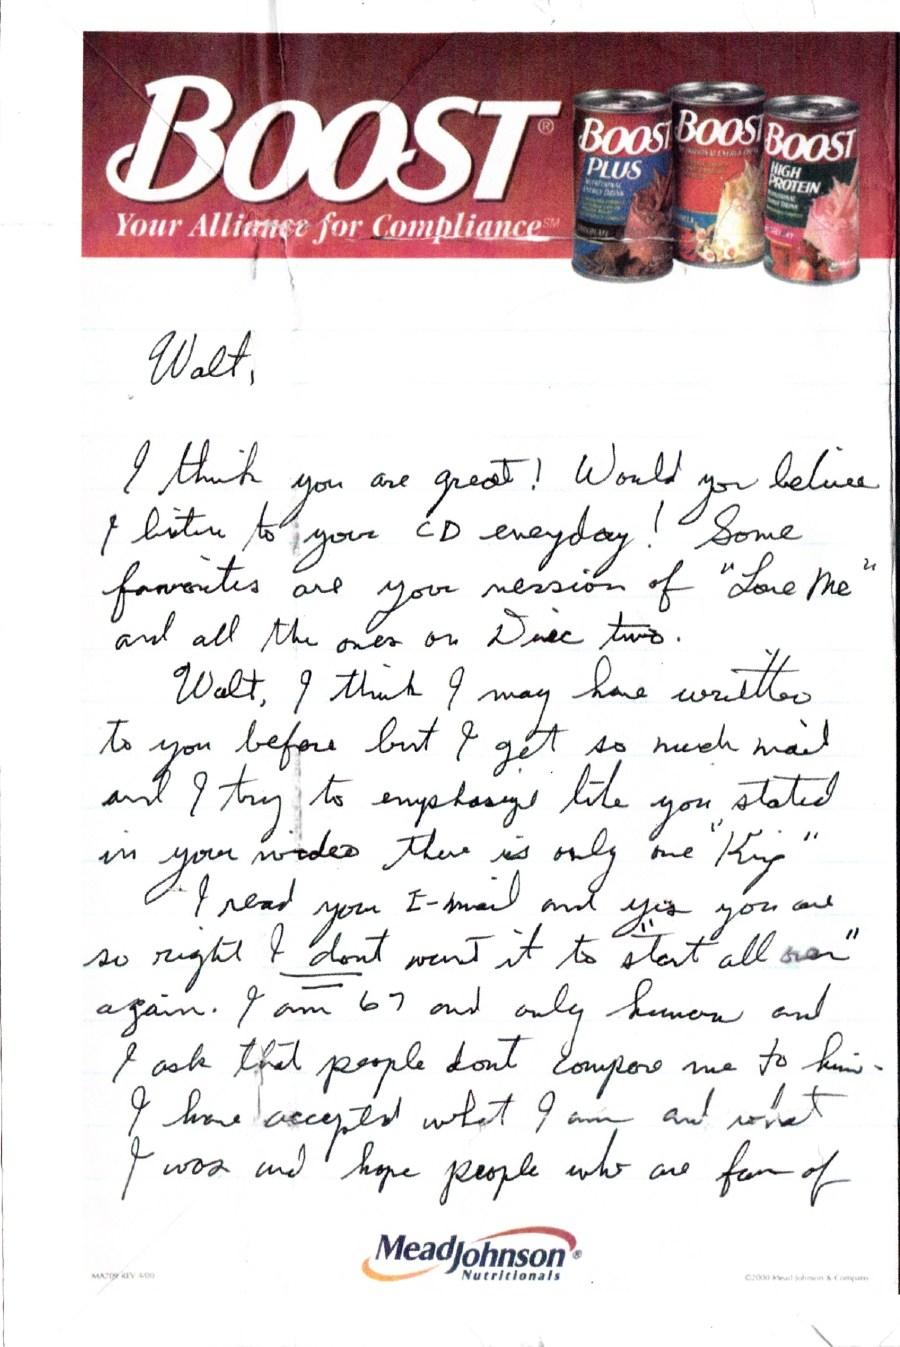 Jesse's letter to Walt page 1